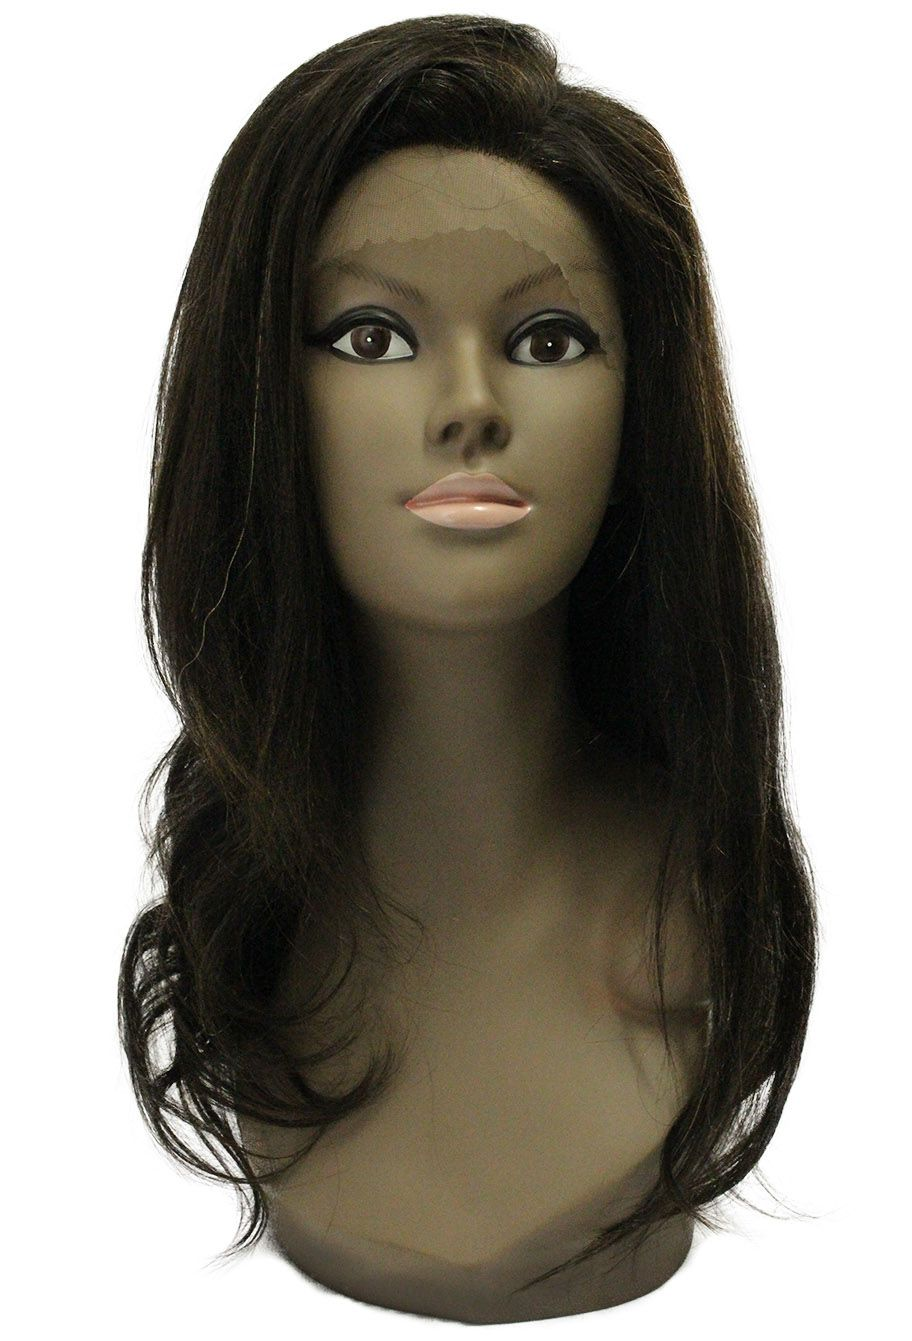 Peruca de Cabelo Humano - Front/Top Lace Modern Girl - Alisa